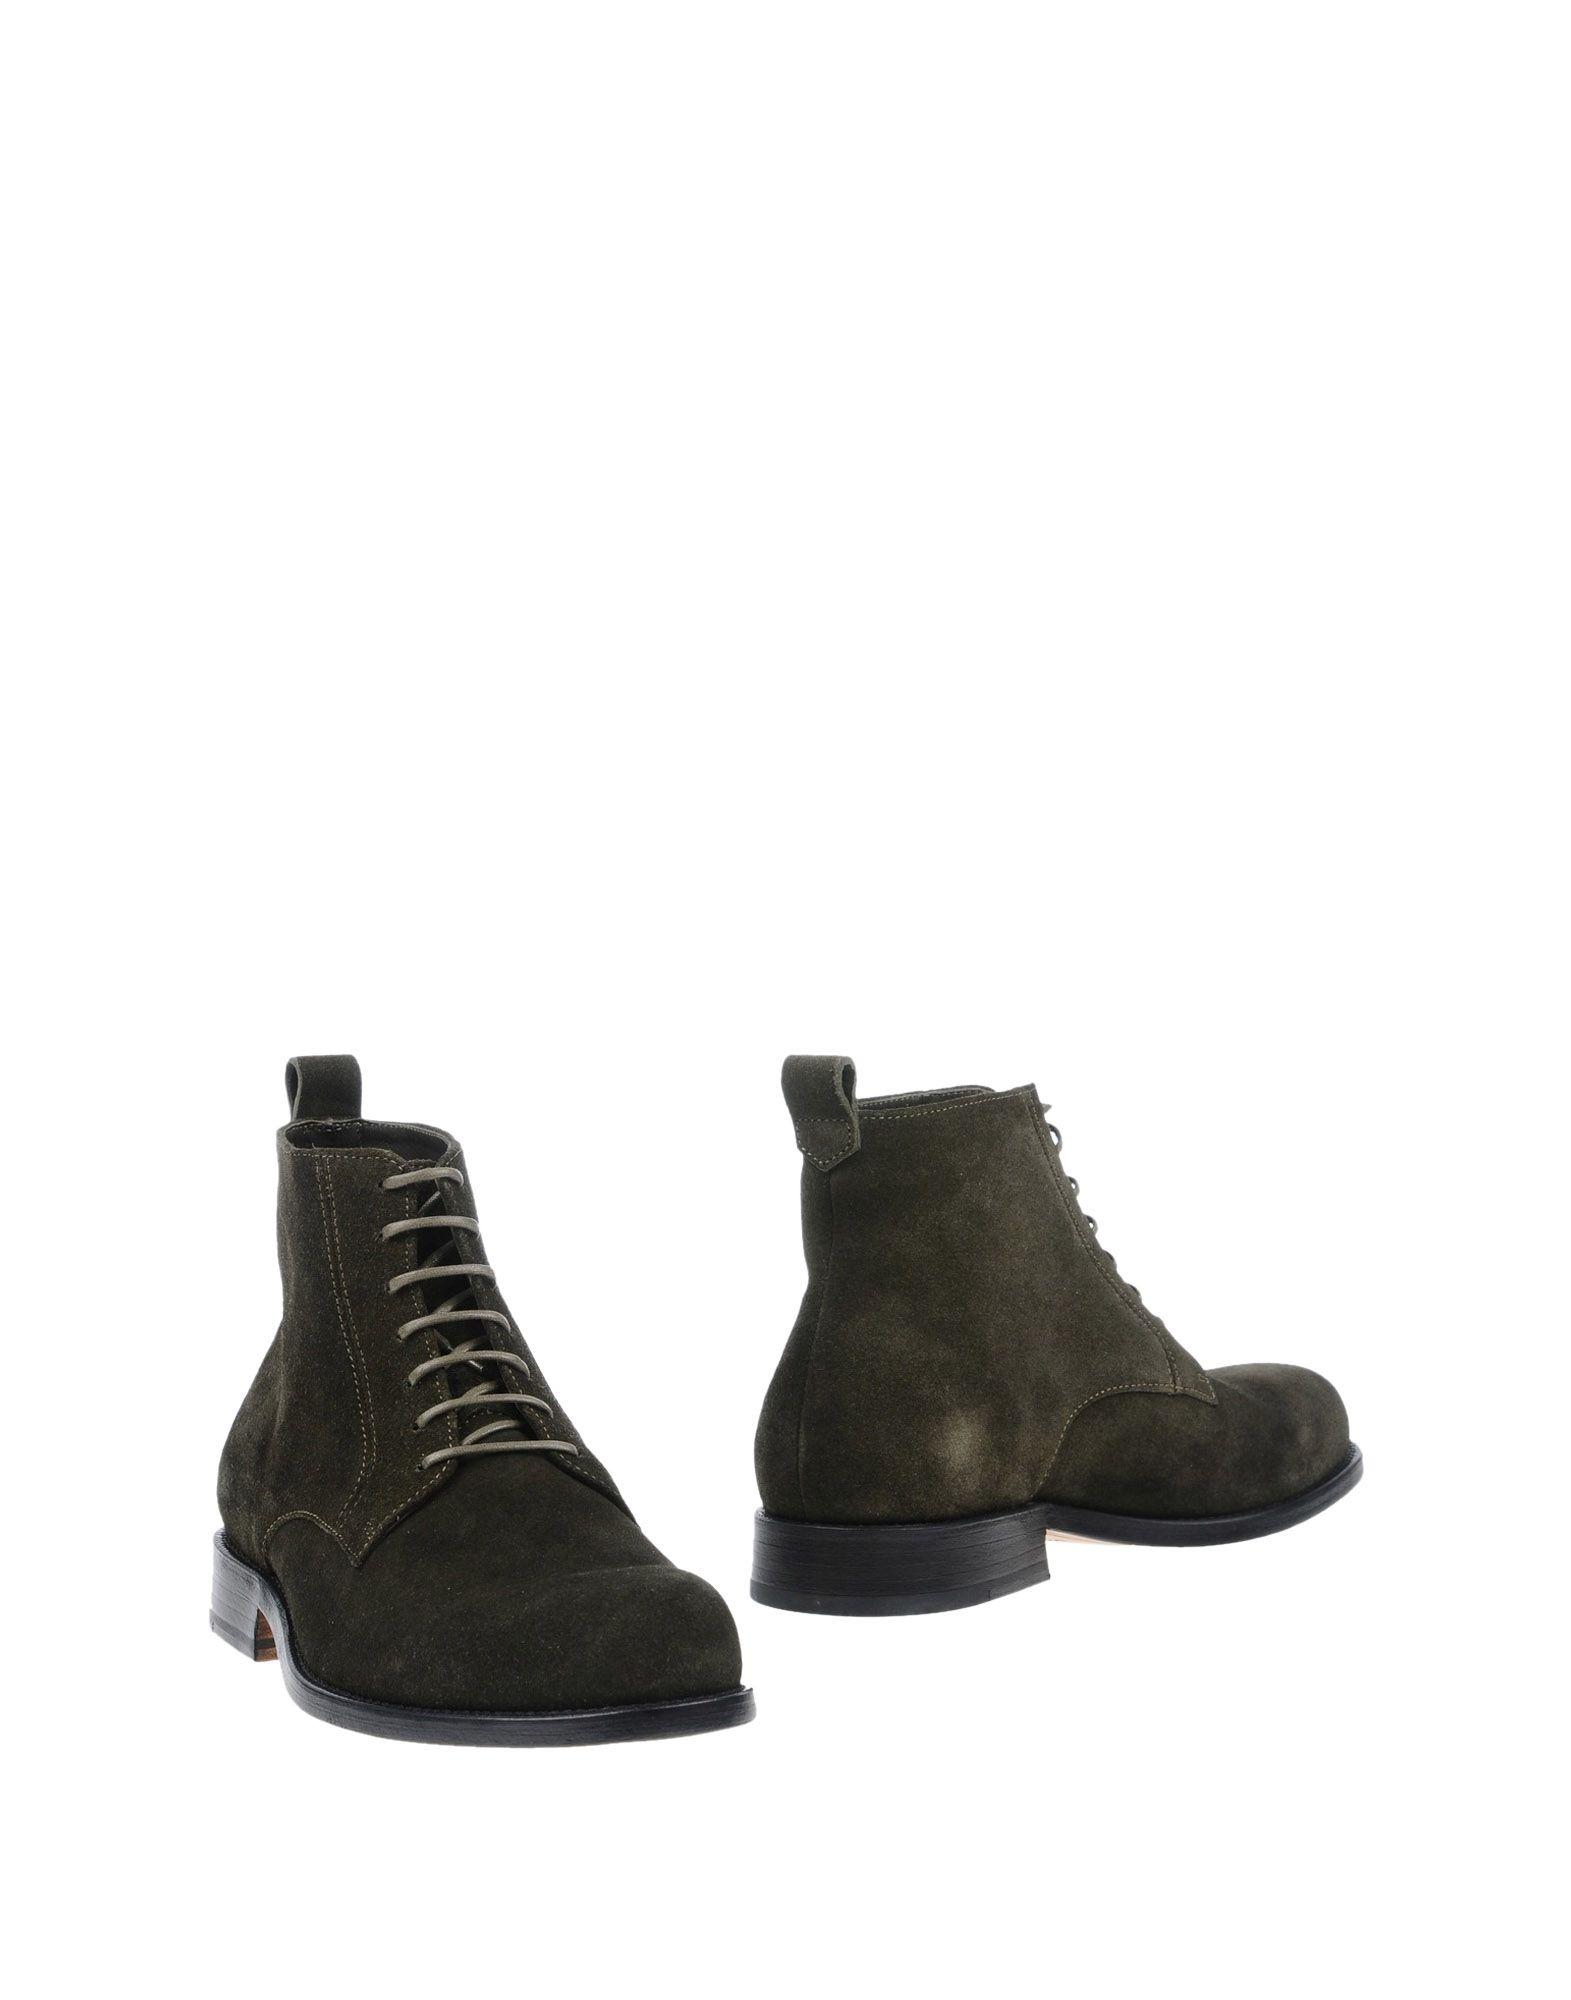 MAISON KITSUNÉ Полусапоги и высокие ботинки